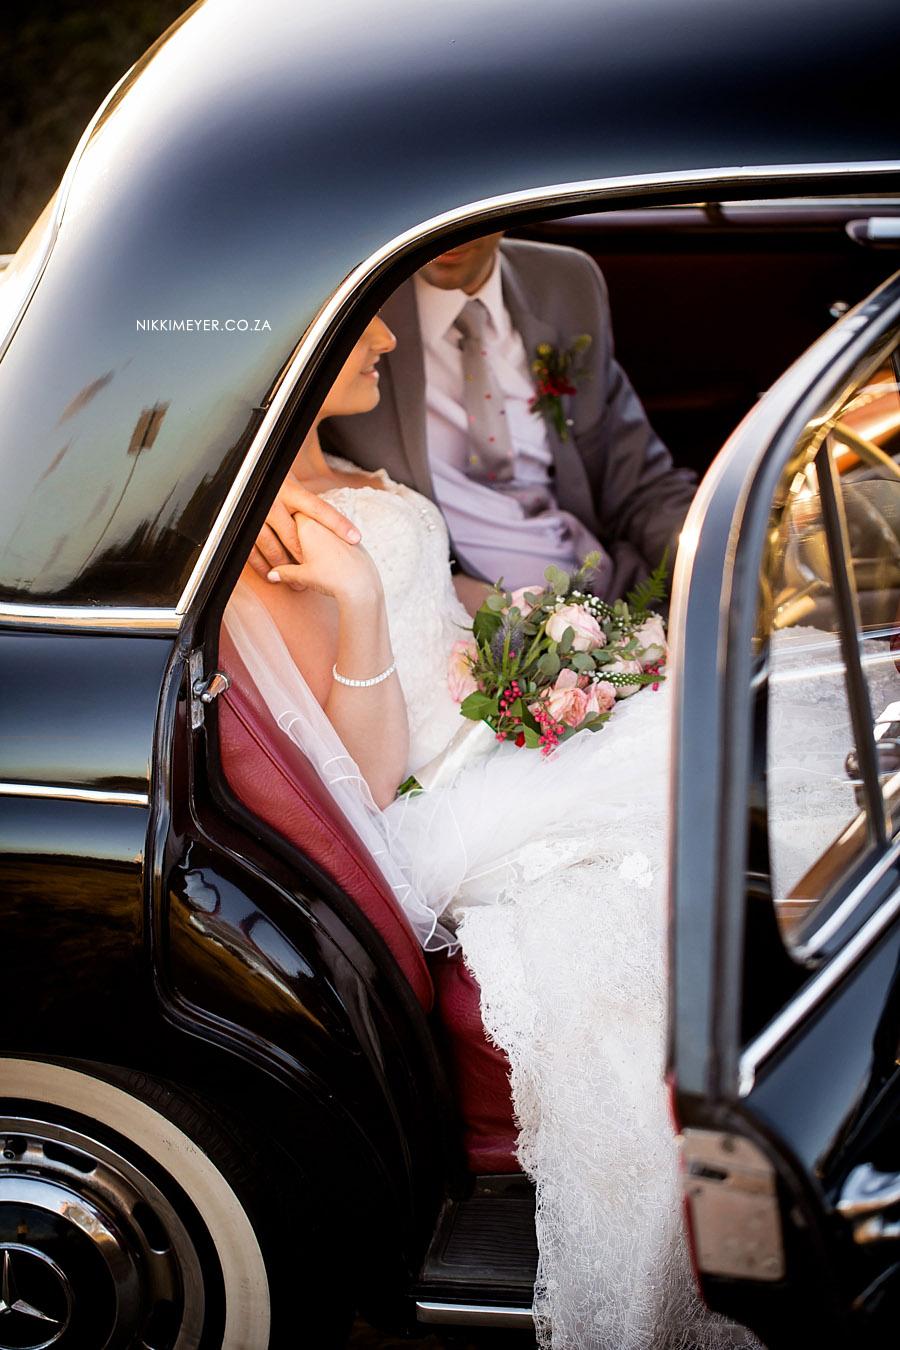 nikki_meyer_wedding_photographer_Cape_Town_044